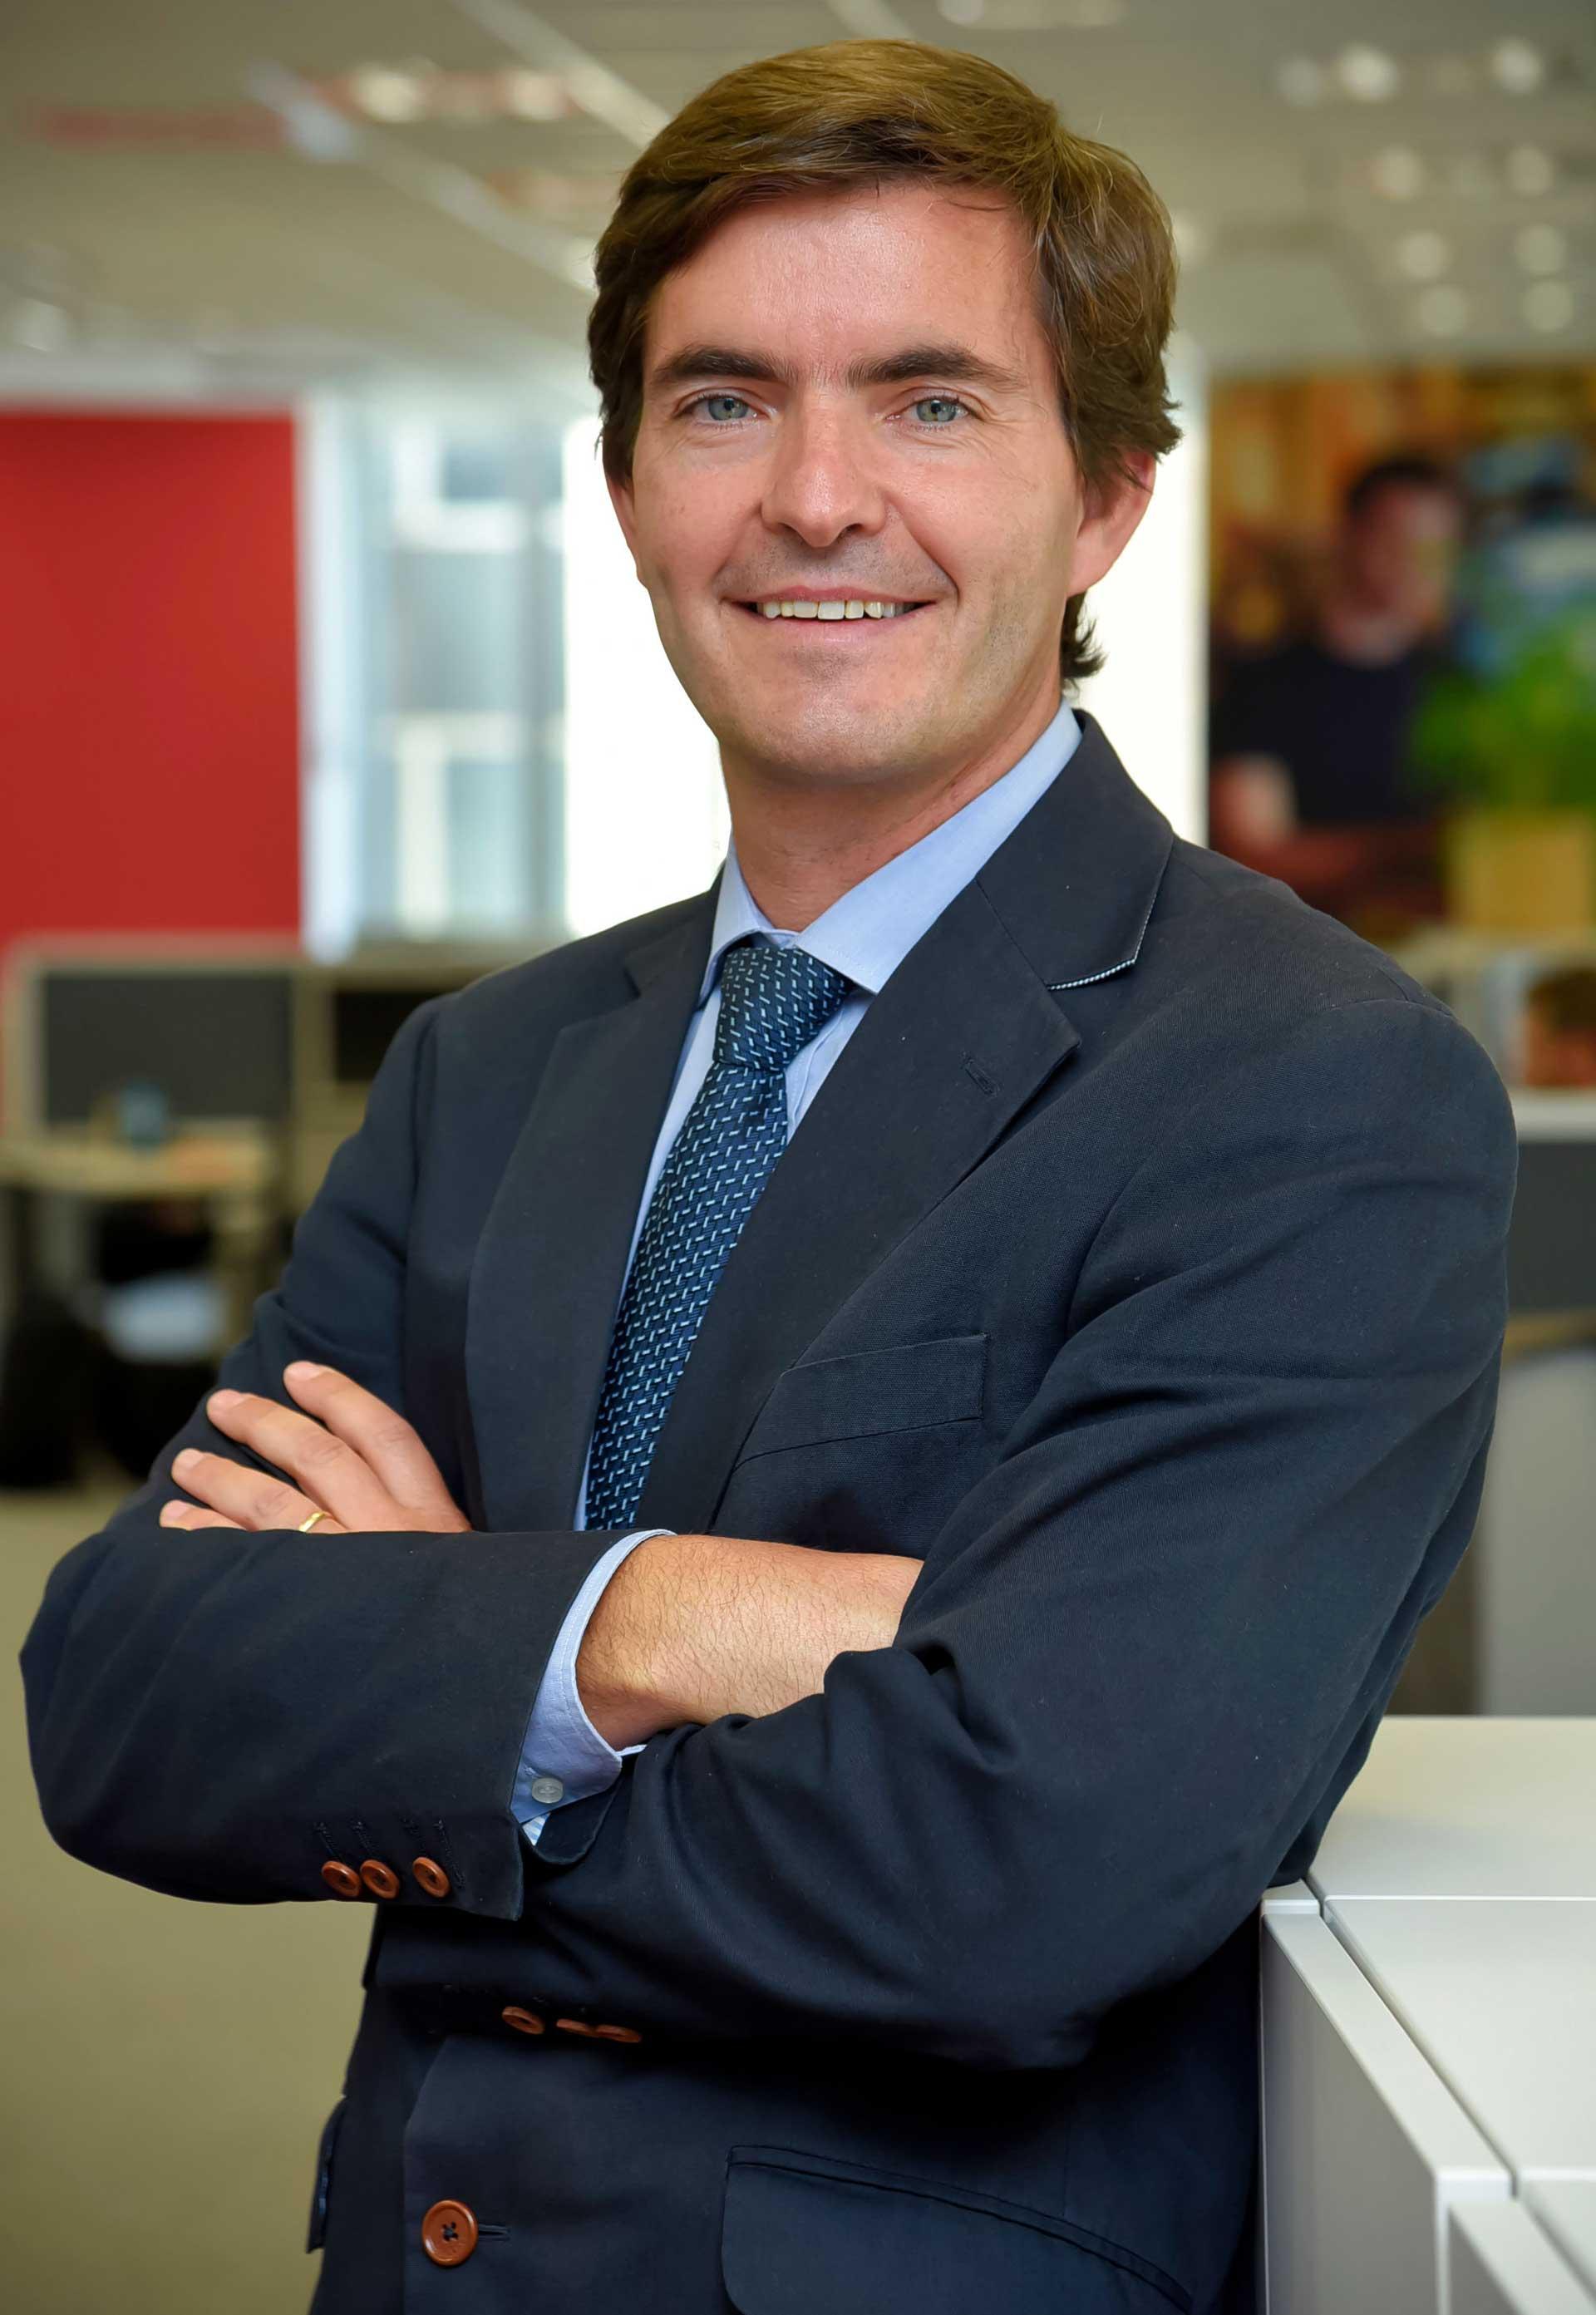 Lenovo nombra a Juan Chinchilla nuevo Director de Marketing del sur de Europa para Lenovo EMEA